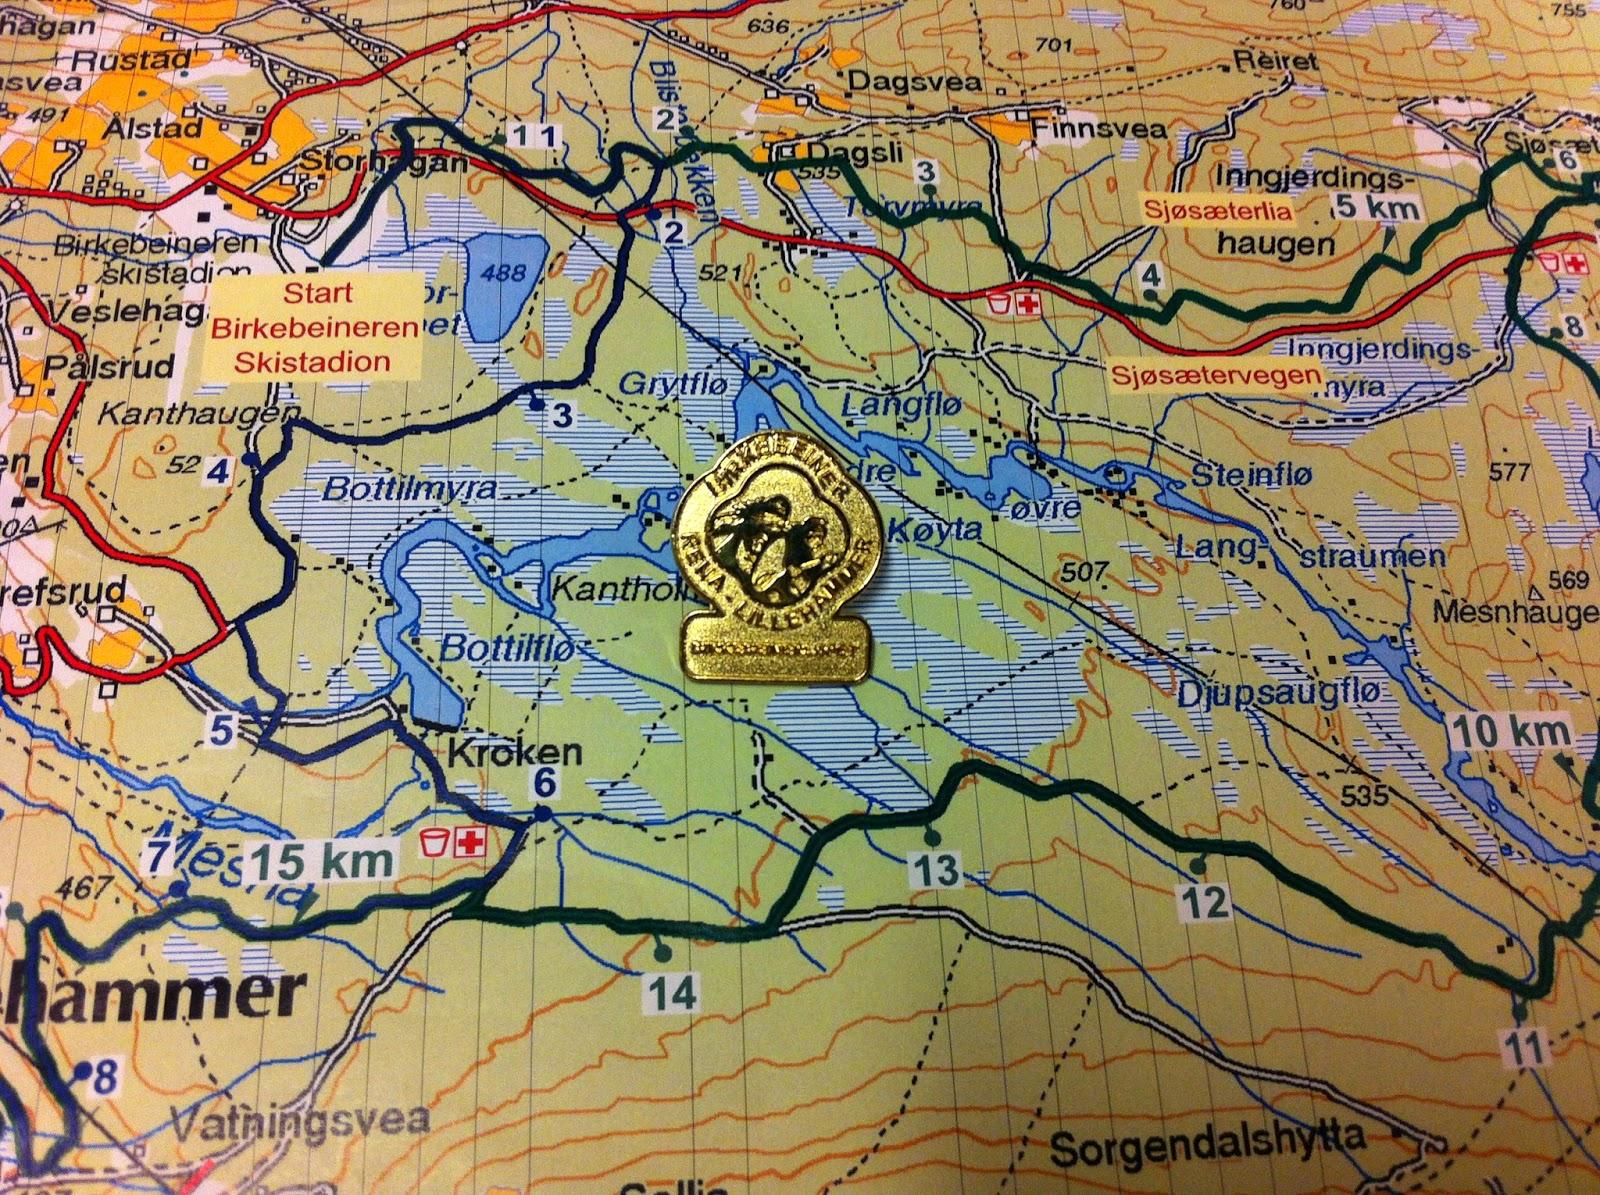 birkebeinerløypa kart Gulljakt i Birkebeinerløypa | moromedkondis : )